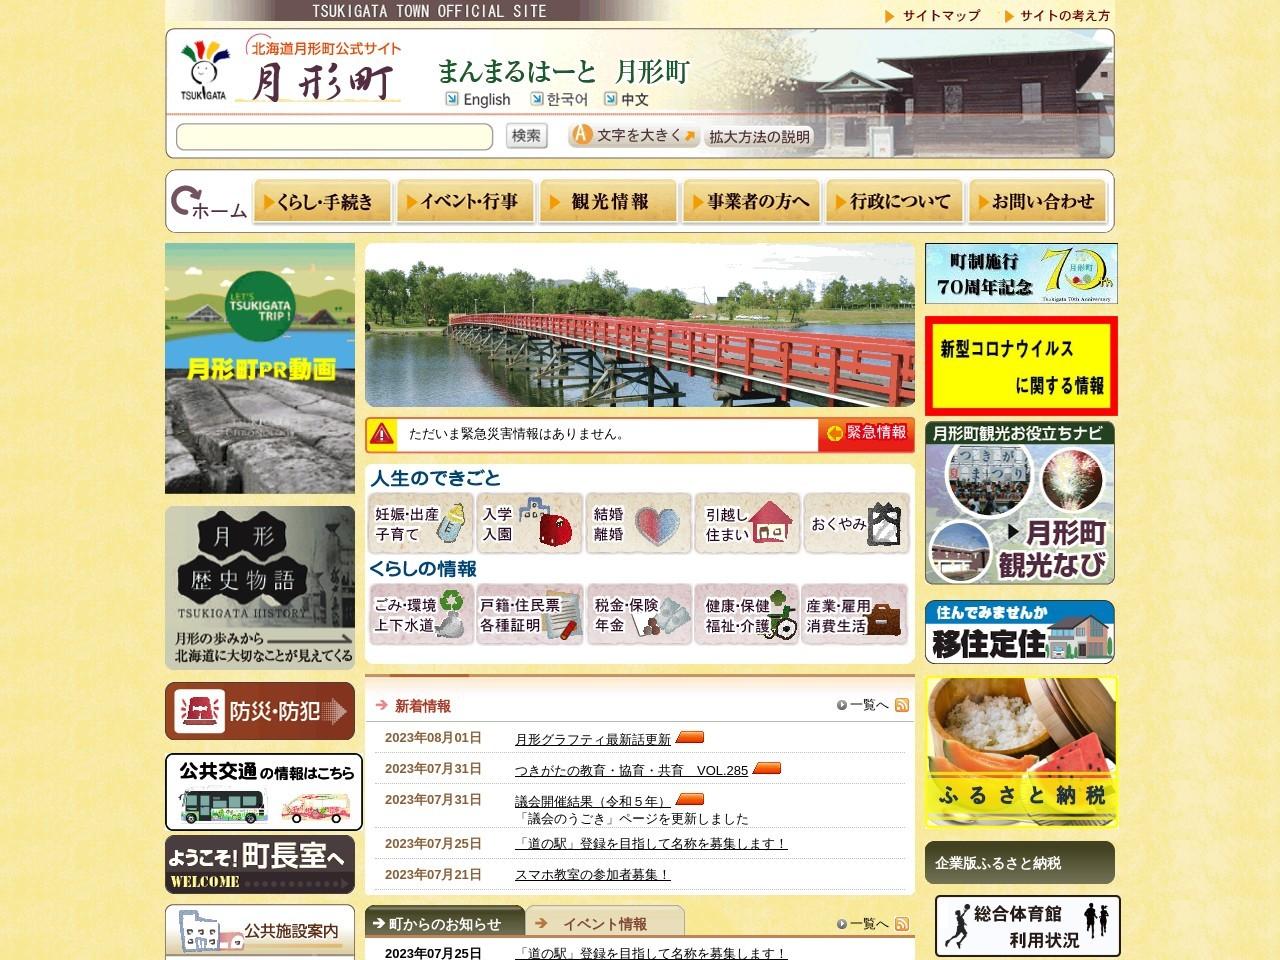 http://www.town.tsukigata.hokkaido.jp/